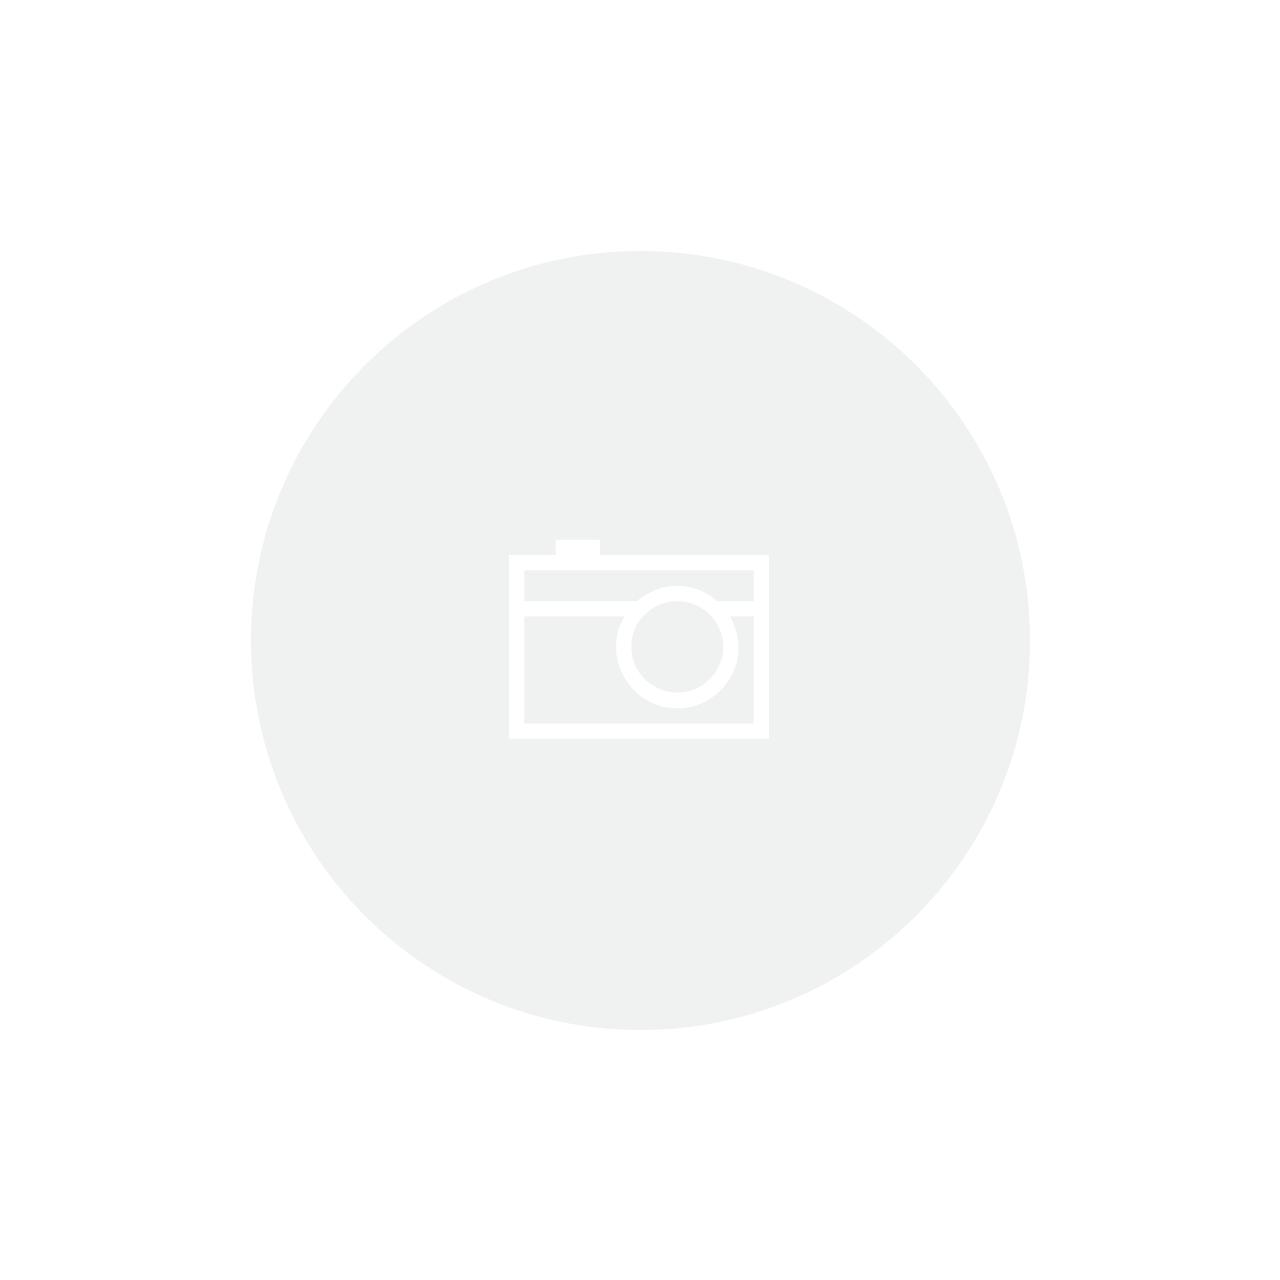 Blusa Onça Cardada 115IF17 Est 002